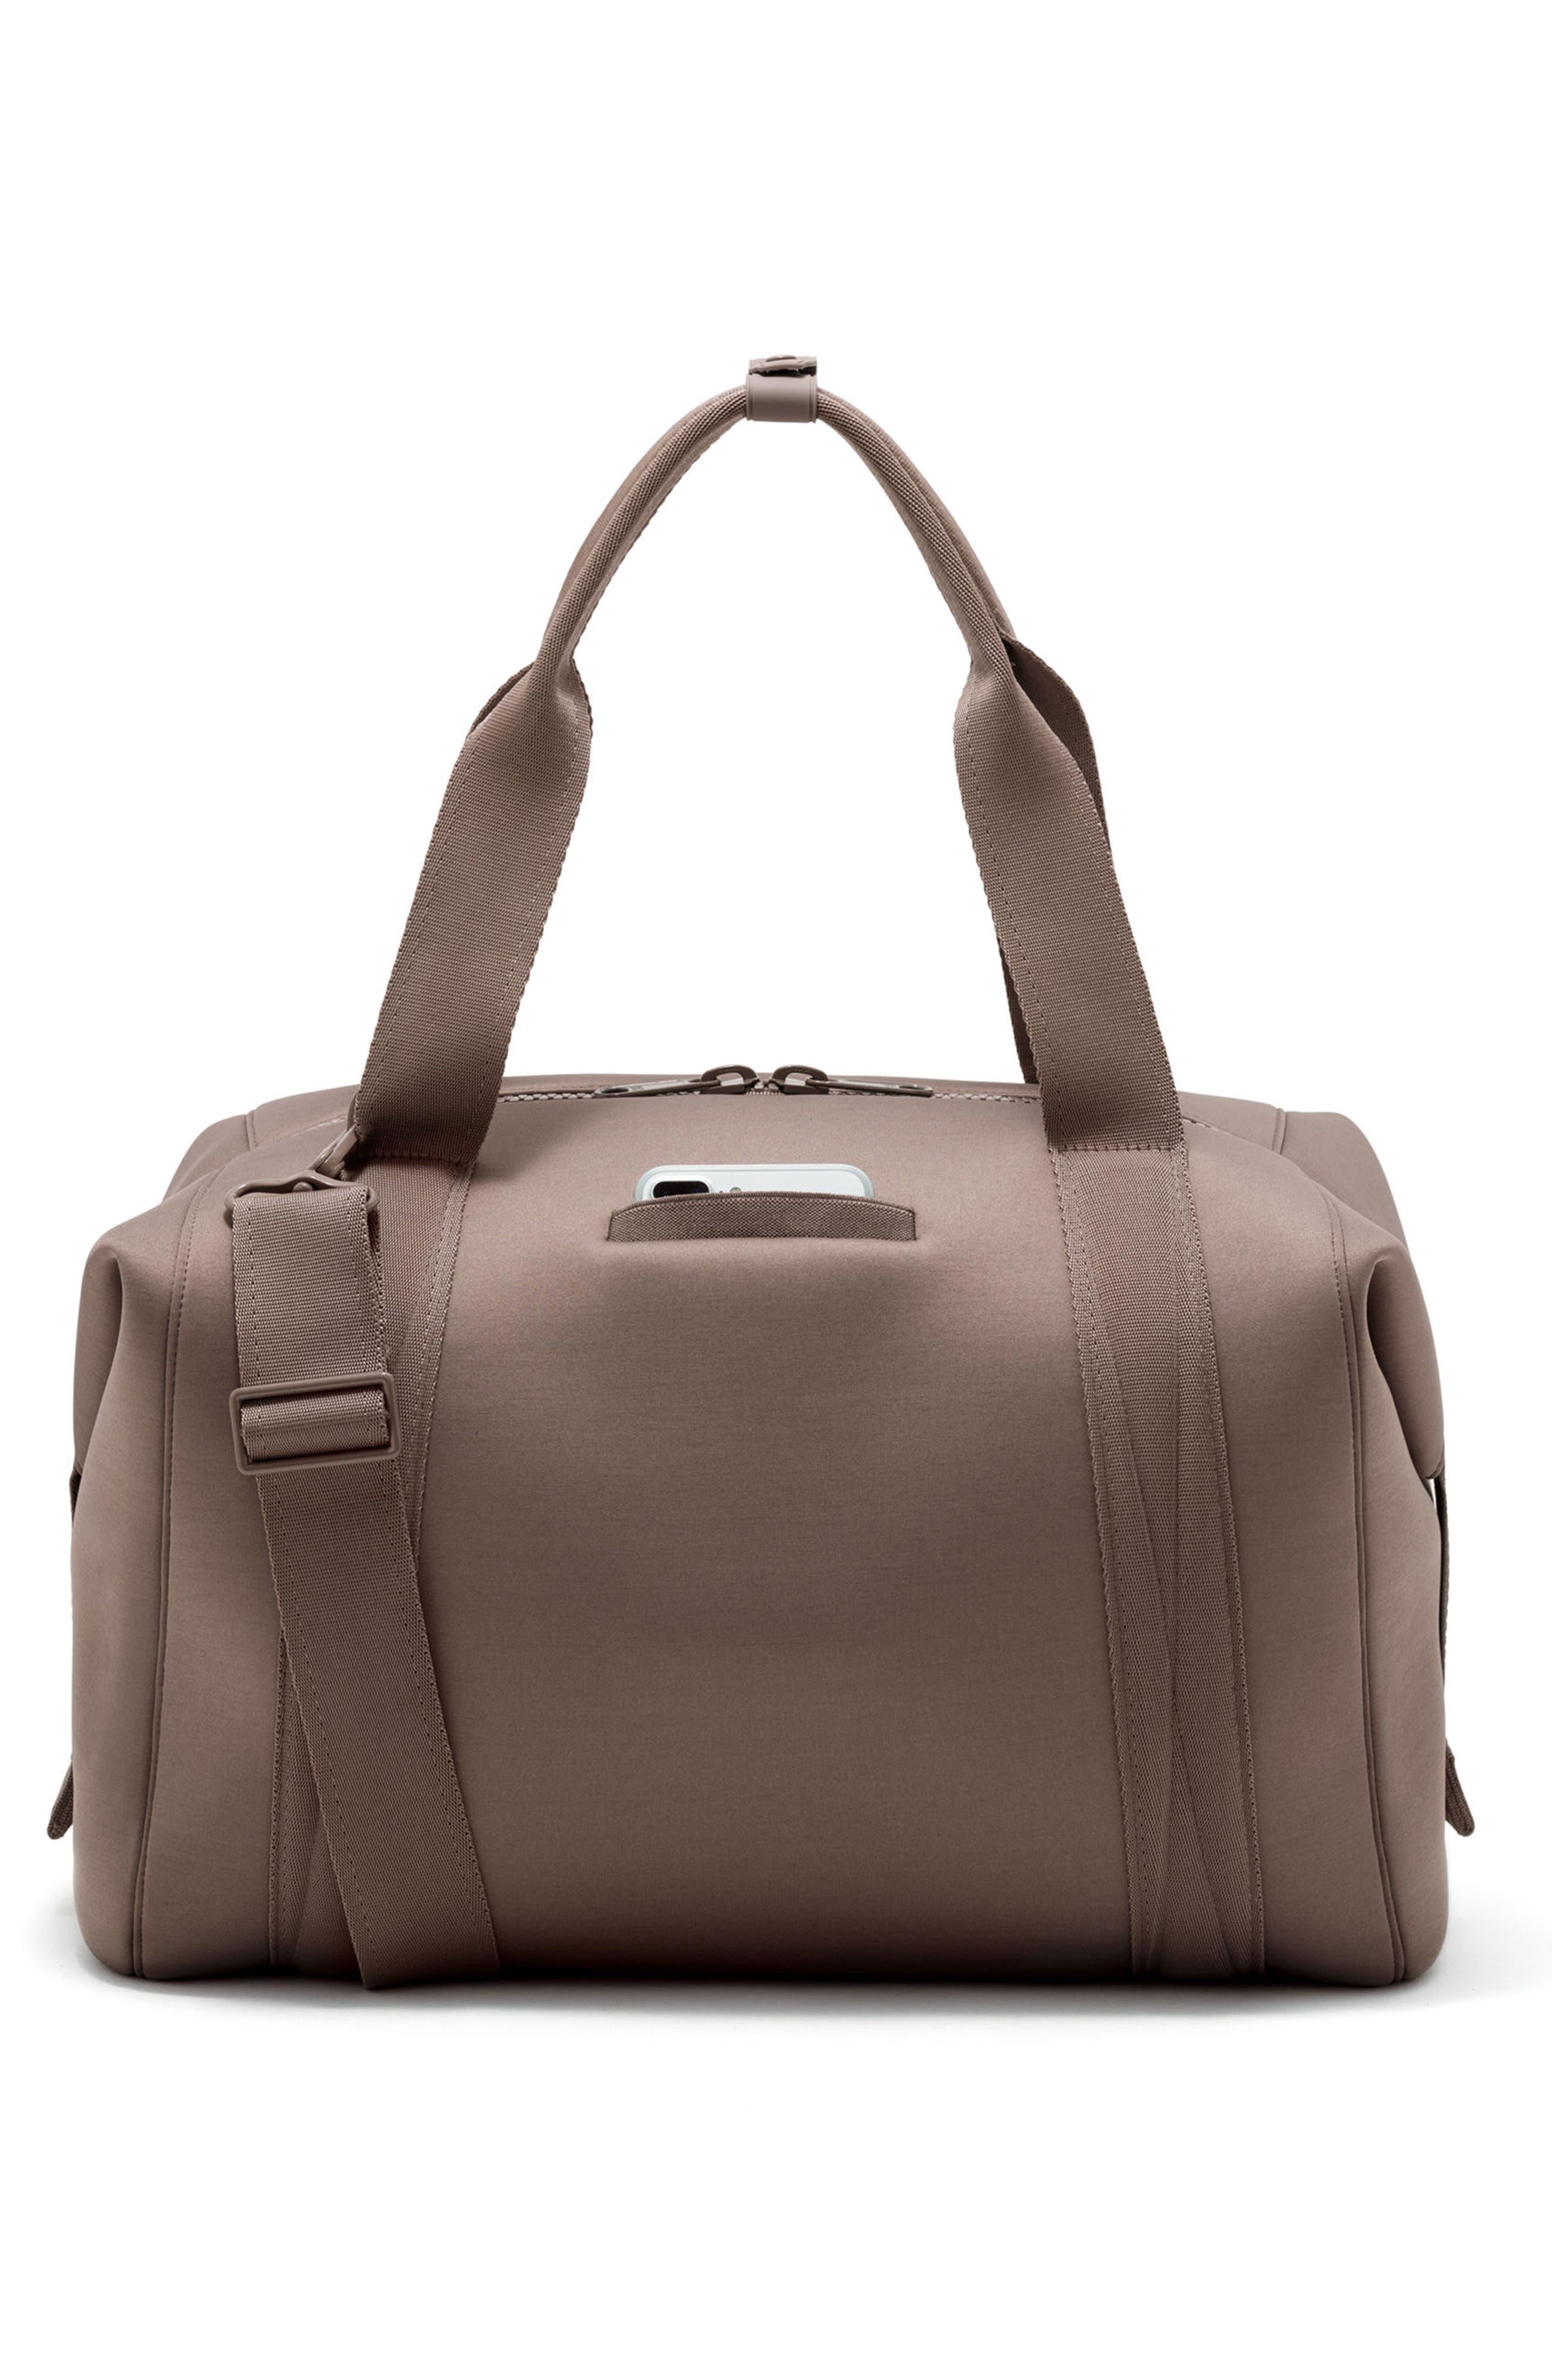 365 Large Landon Neoprene Carryall Duffel Bag,                             Alternate thumbnail 30, color,